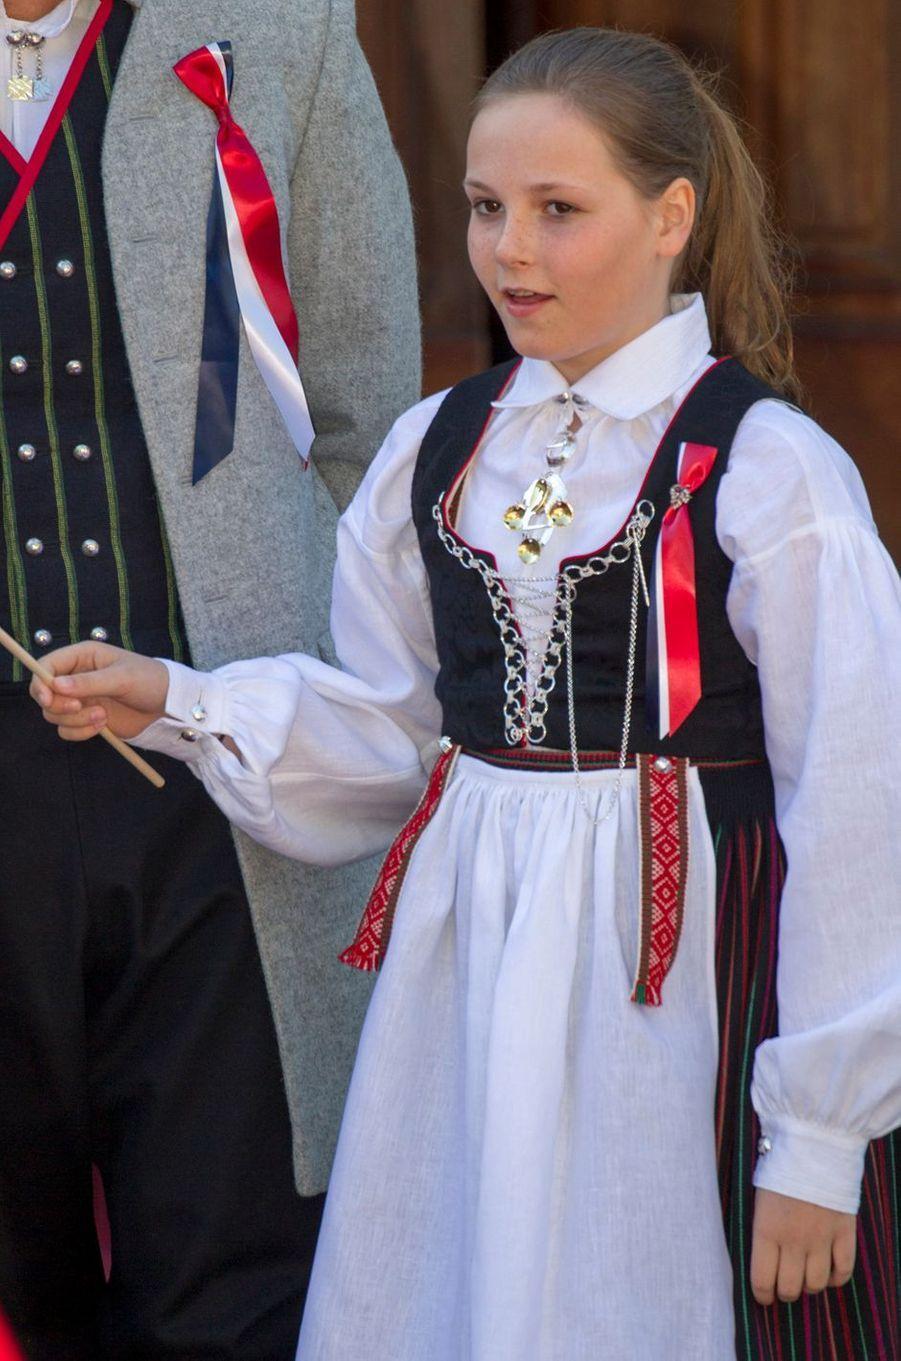 La princesse Ingrid Alexandra de Norvège à Skaugum, le 17 mai 2016